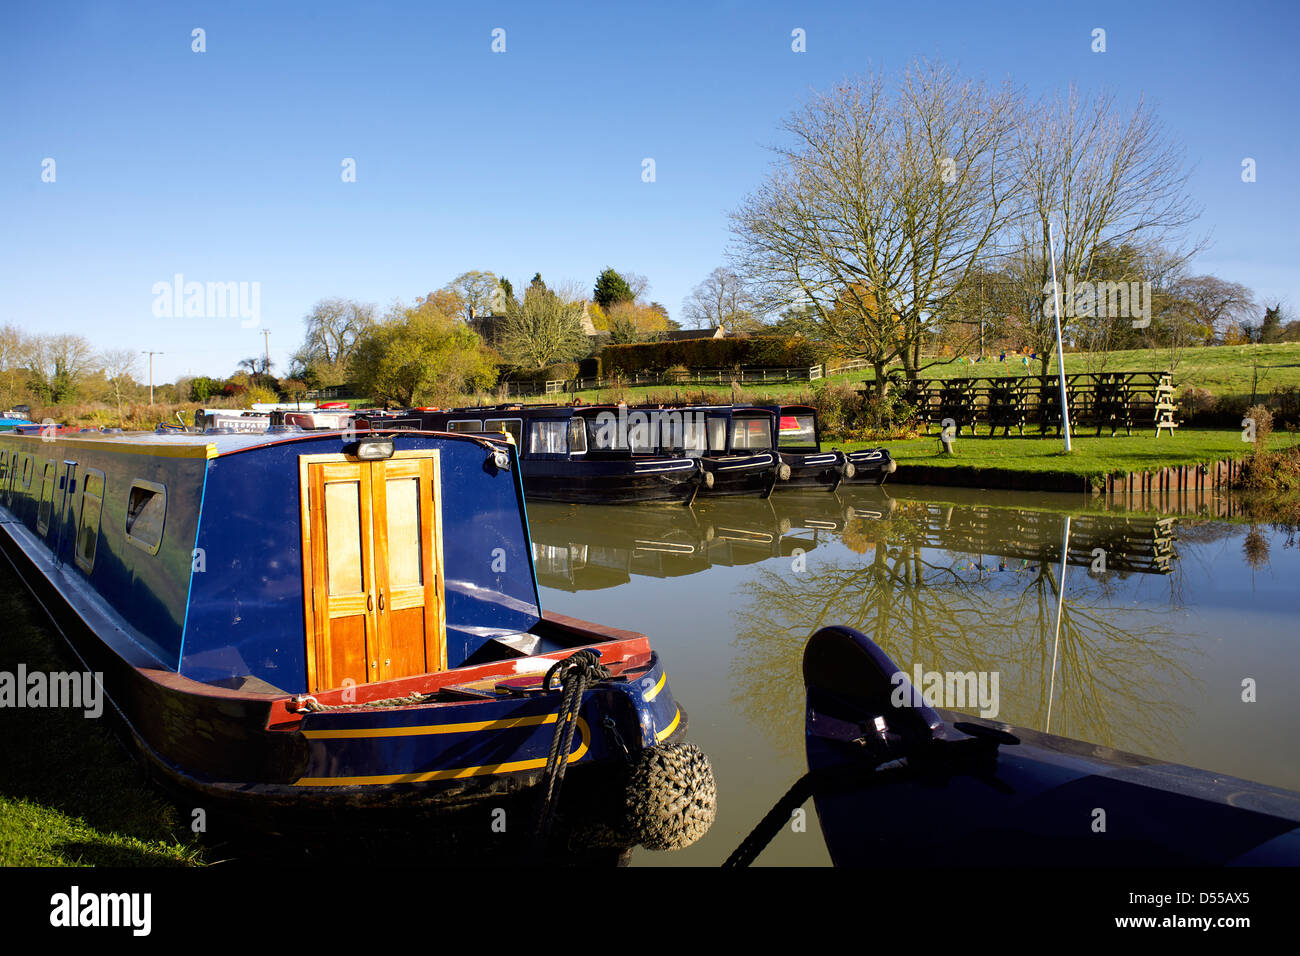 Narrowboats on the South Oxford Canal Heyford Wharf Upper Heyford Oxfordshire England UK GB Lower Heyford narrowboat - Stock Image